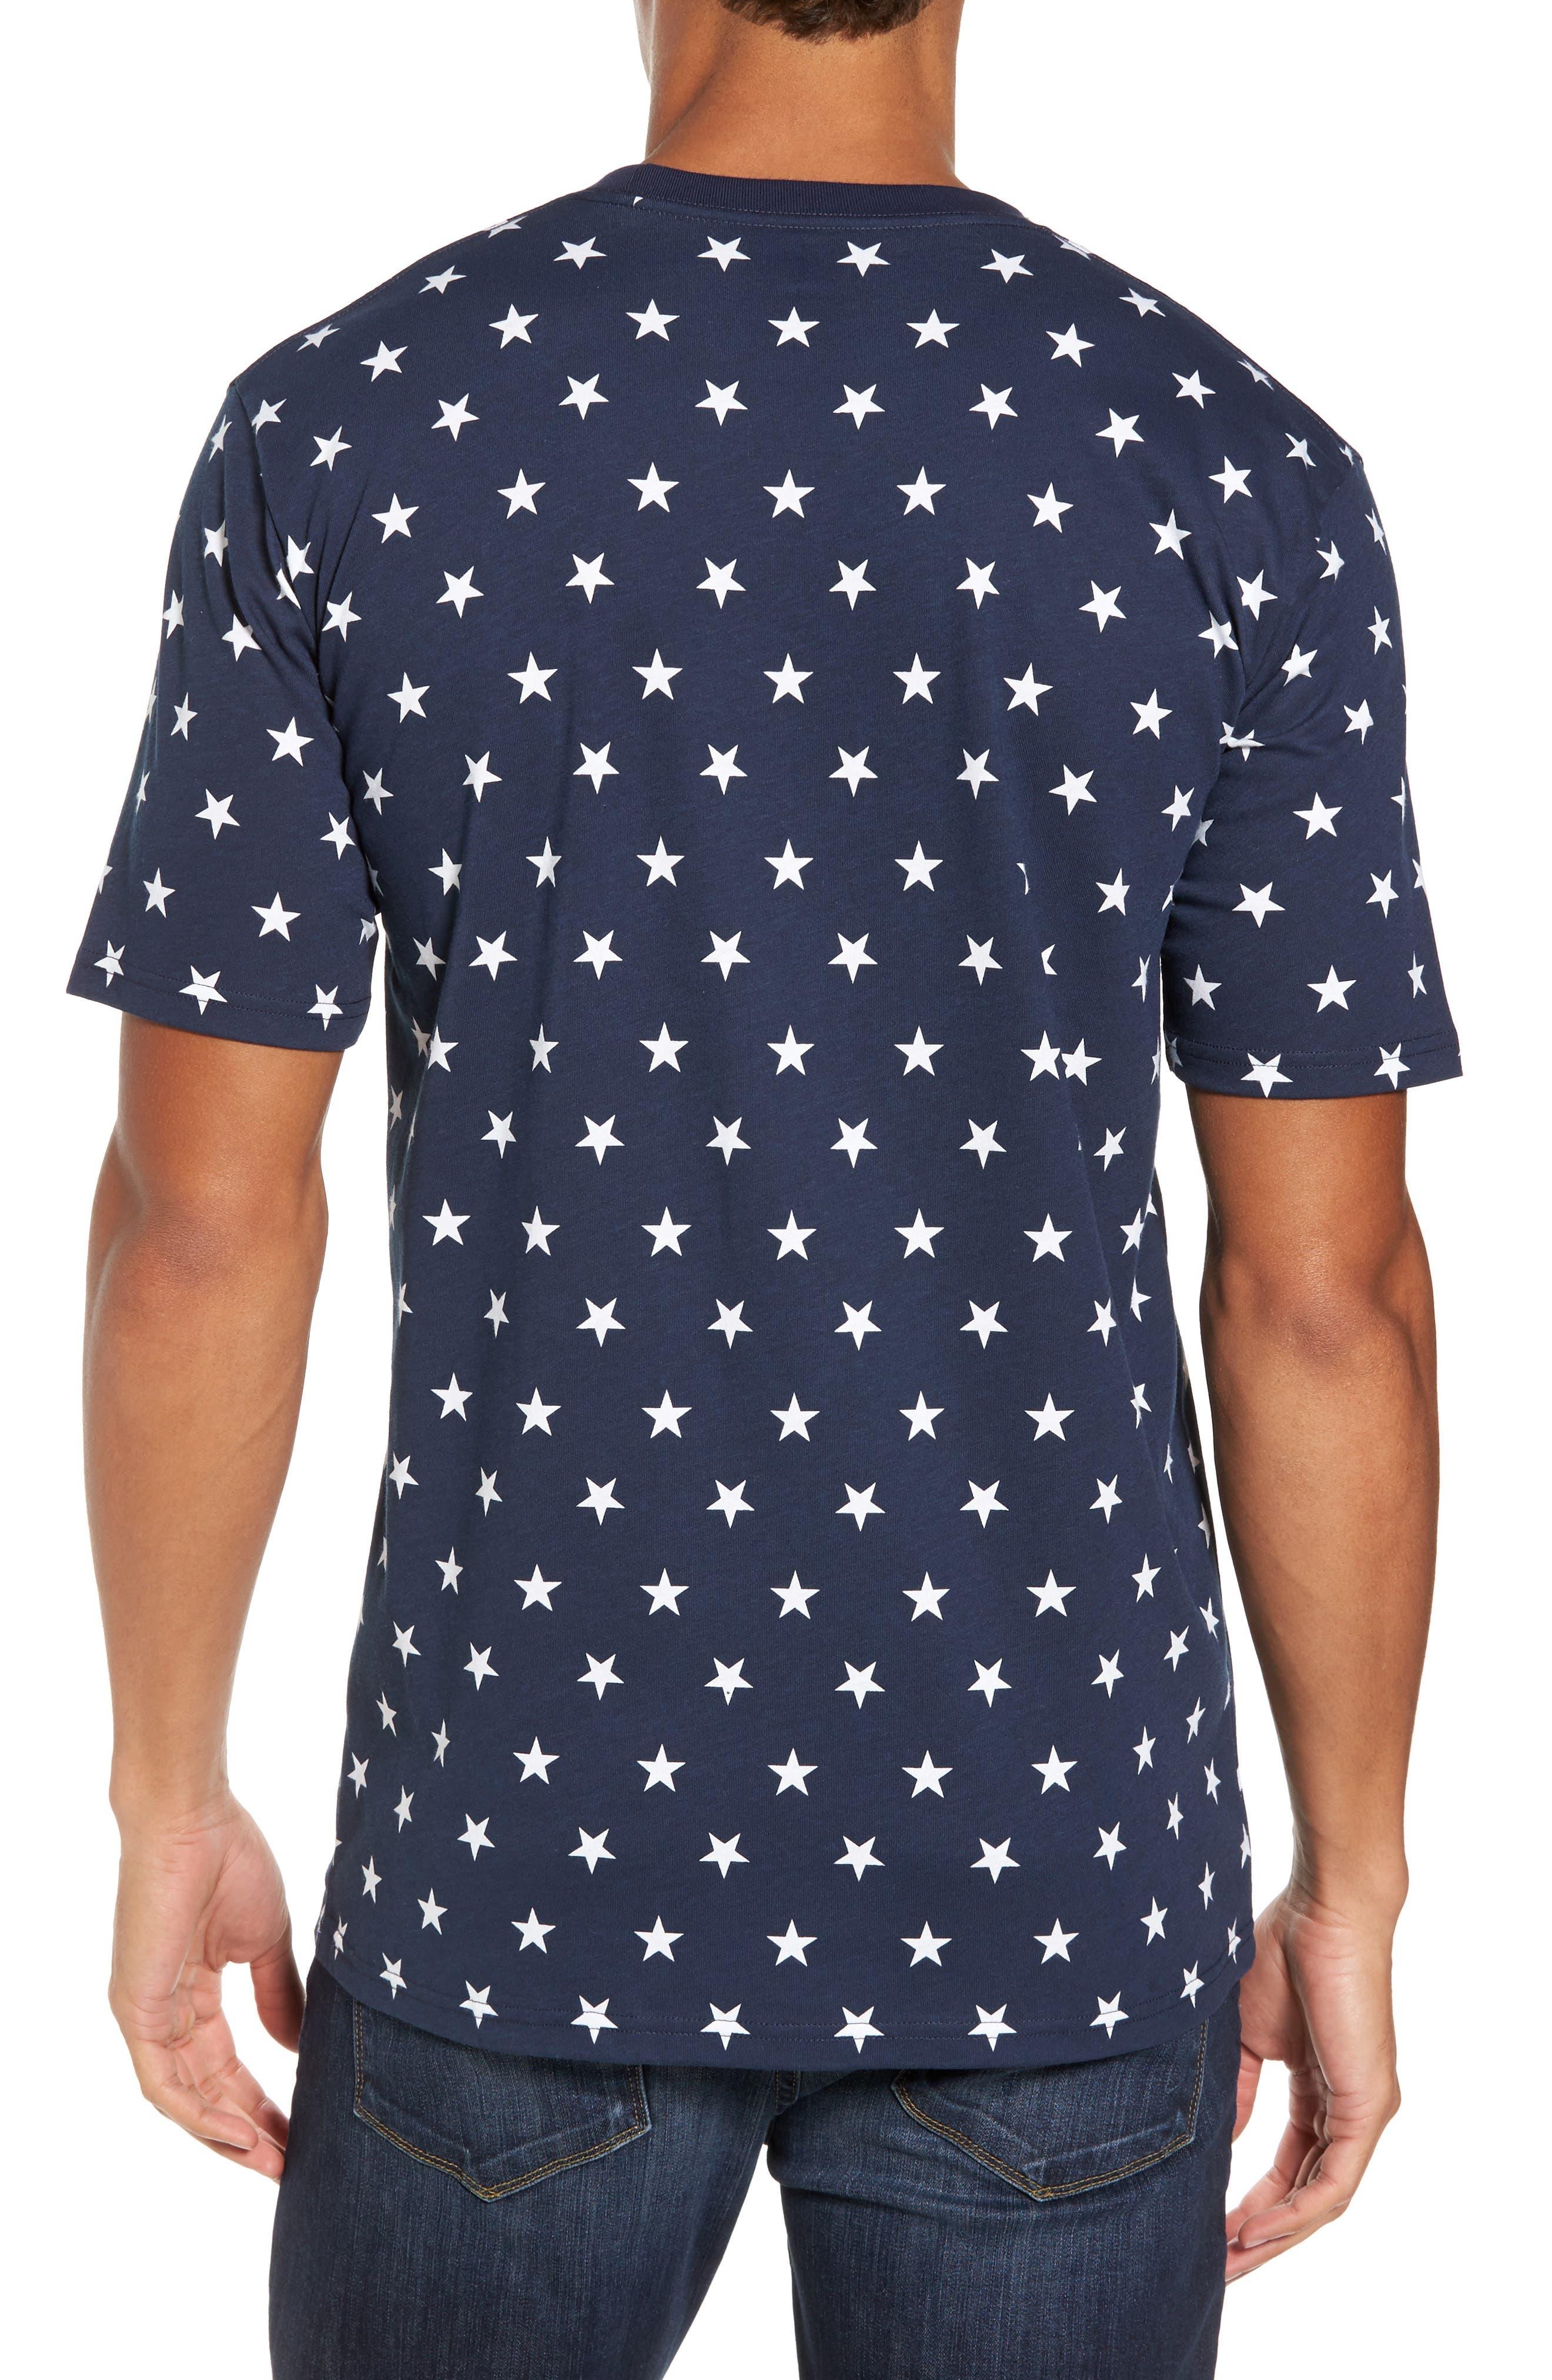 International Collection Star Print T-Shirt,                             Alternate thumbnail 2, color,                             Cosmic Blue Star Print